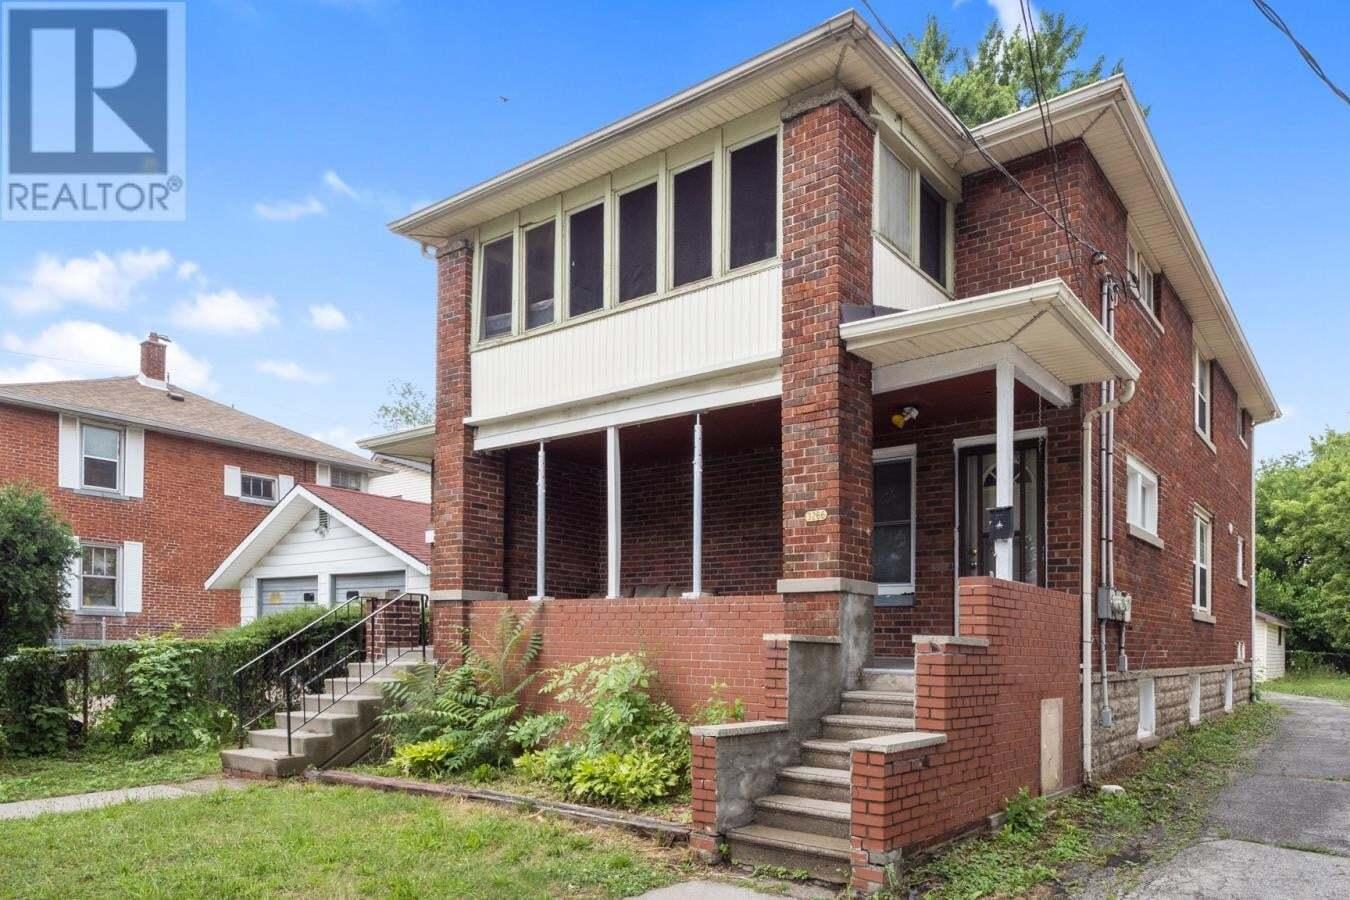 Townhouse for sale at 3266-70 Millen  Windsor Ontario - MLS: 20012216